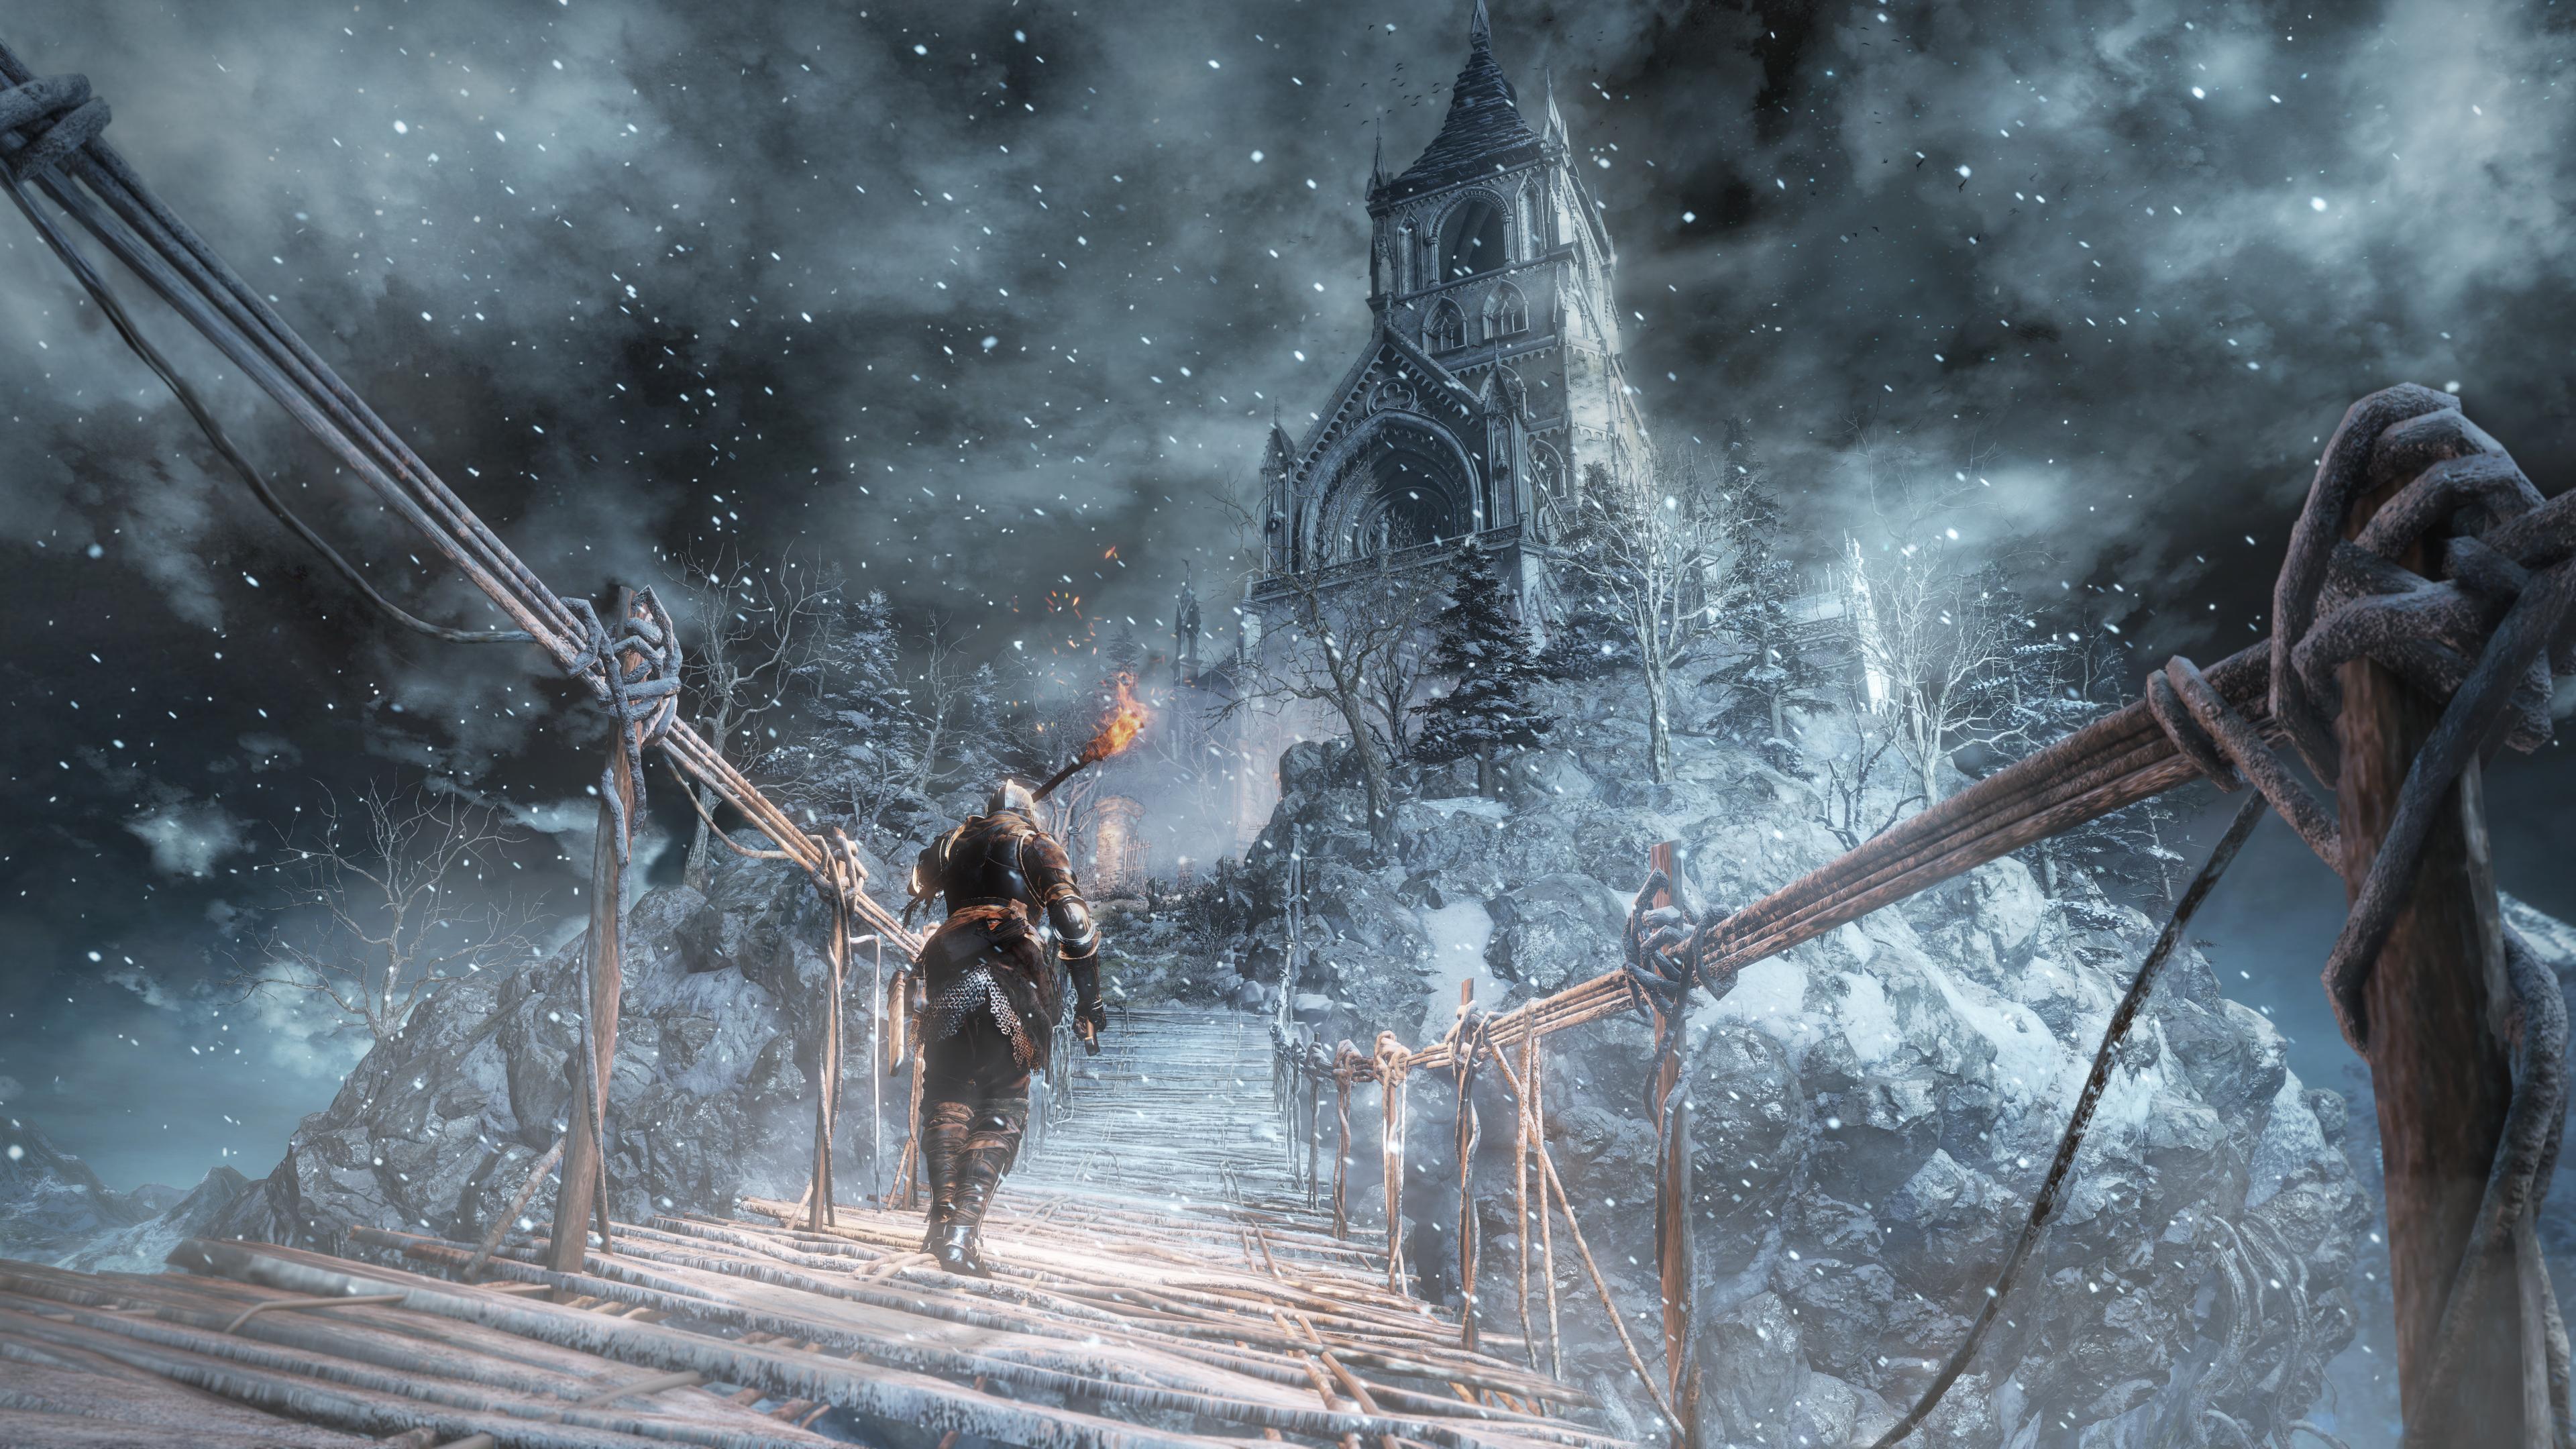 Dark Souls 3 4k Wallpaper: DARK SOULS 3 Ashes Of Ariandel, HD Games, 4k Wallpapers